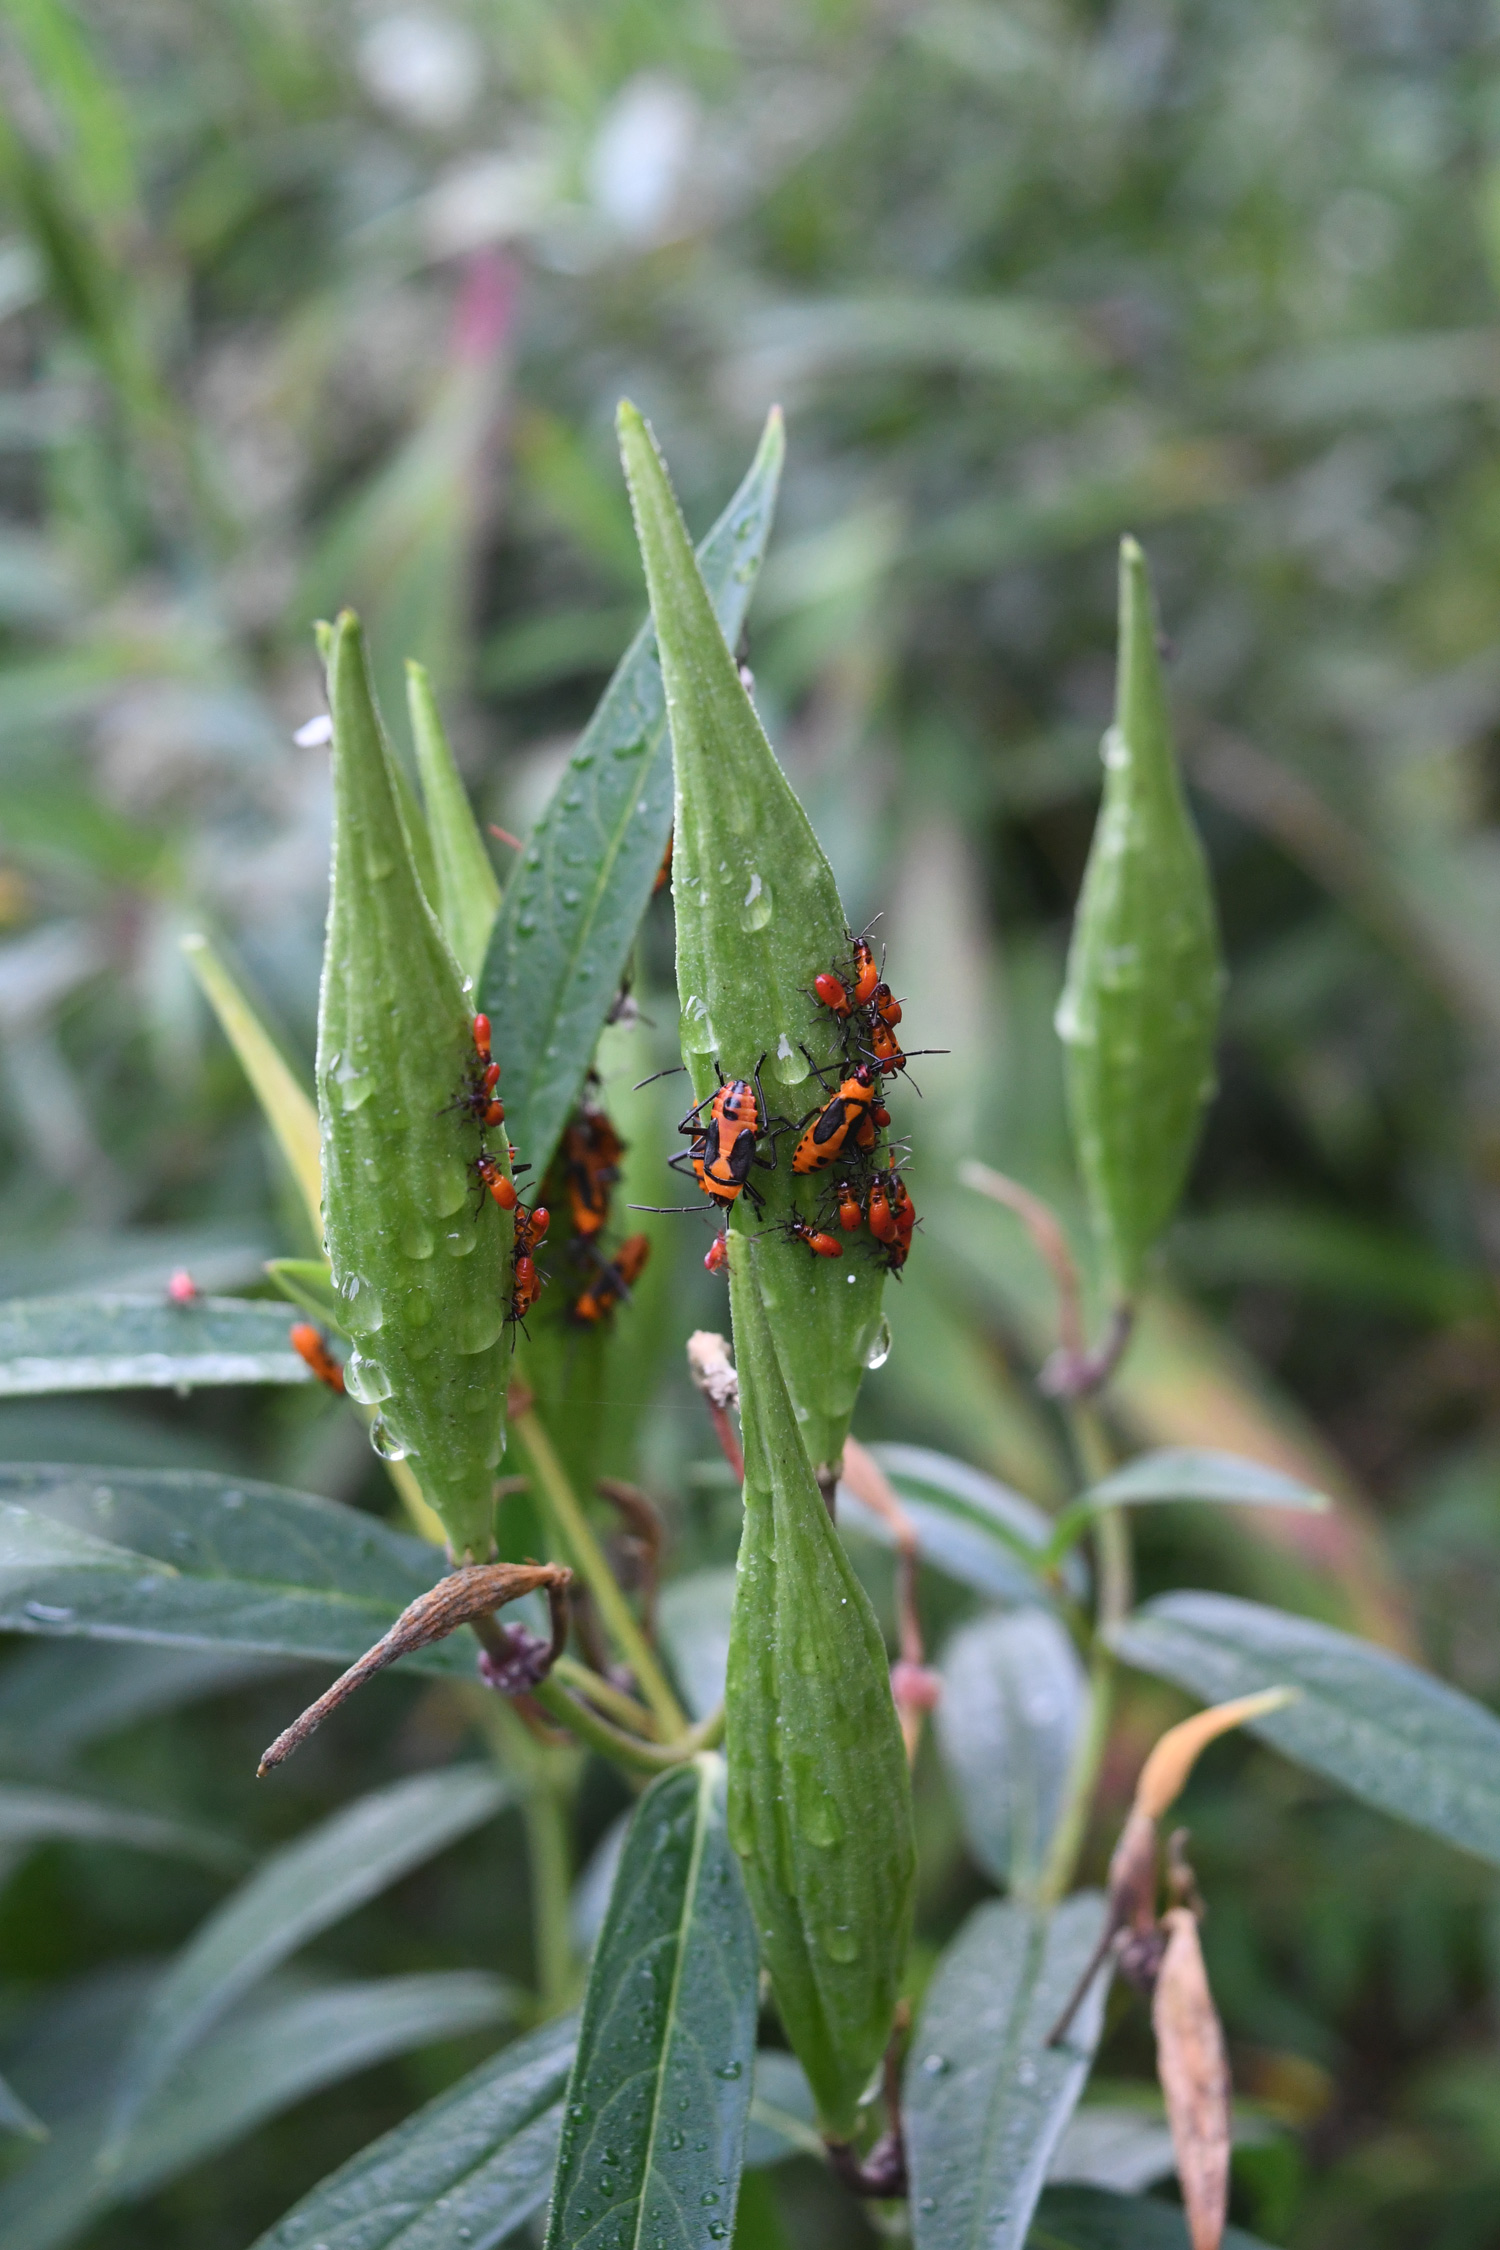 Red beetles on milkweed pod